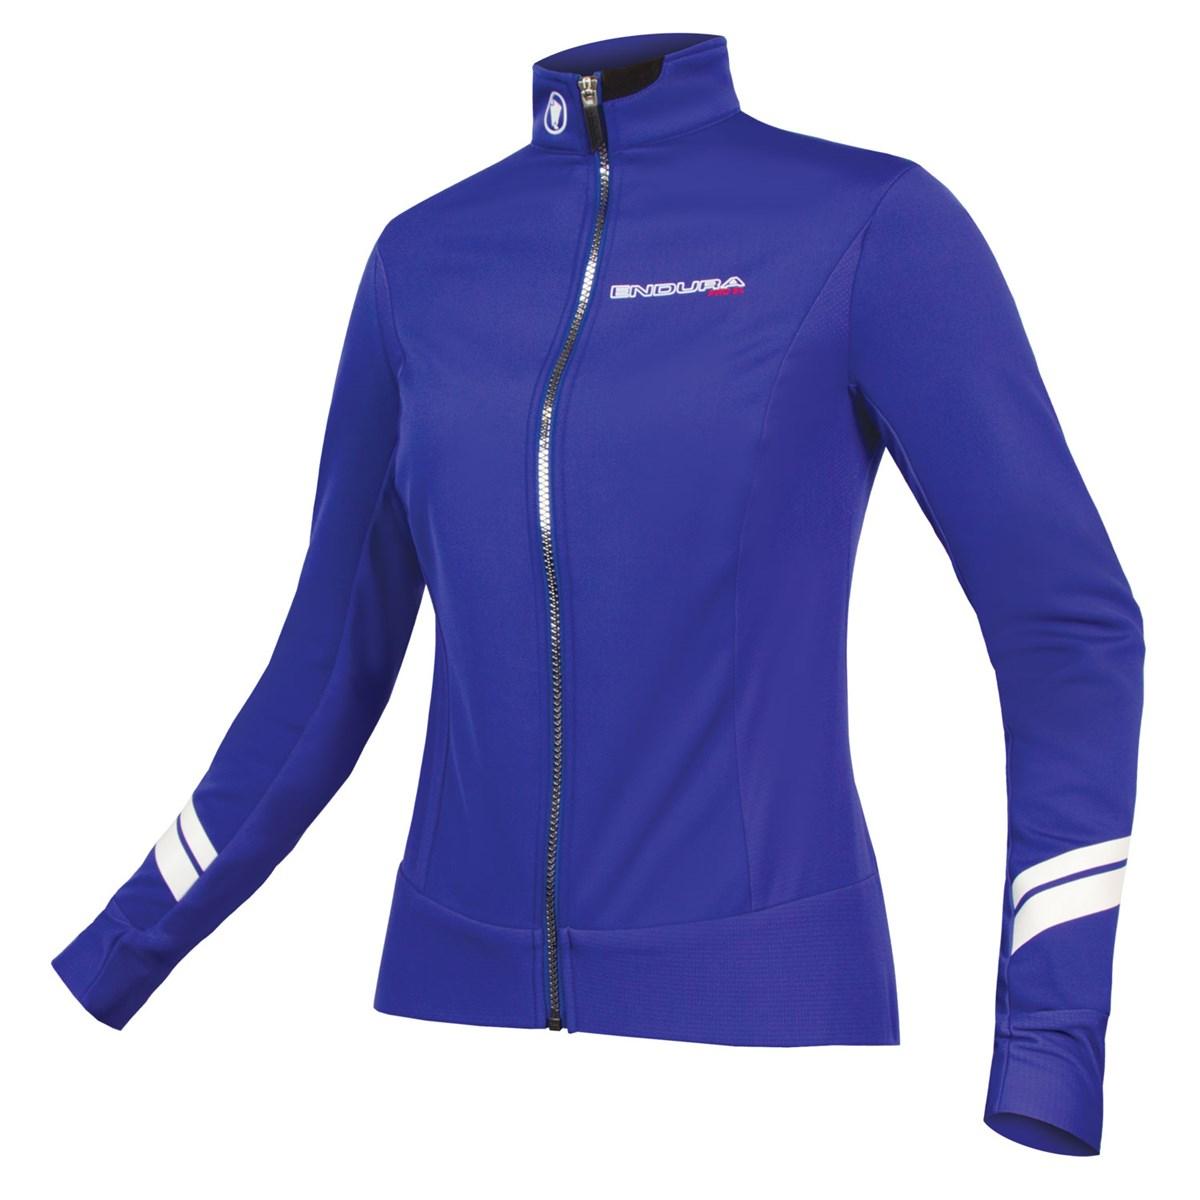 1ccc1dbd4 Endura Womens Pro SL Thermal Windproof Jacket Blue £149.99